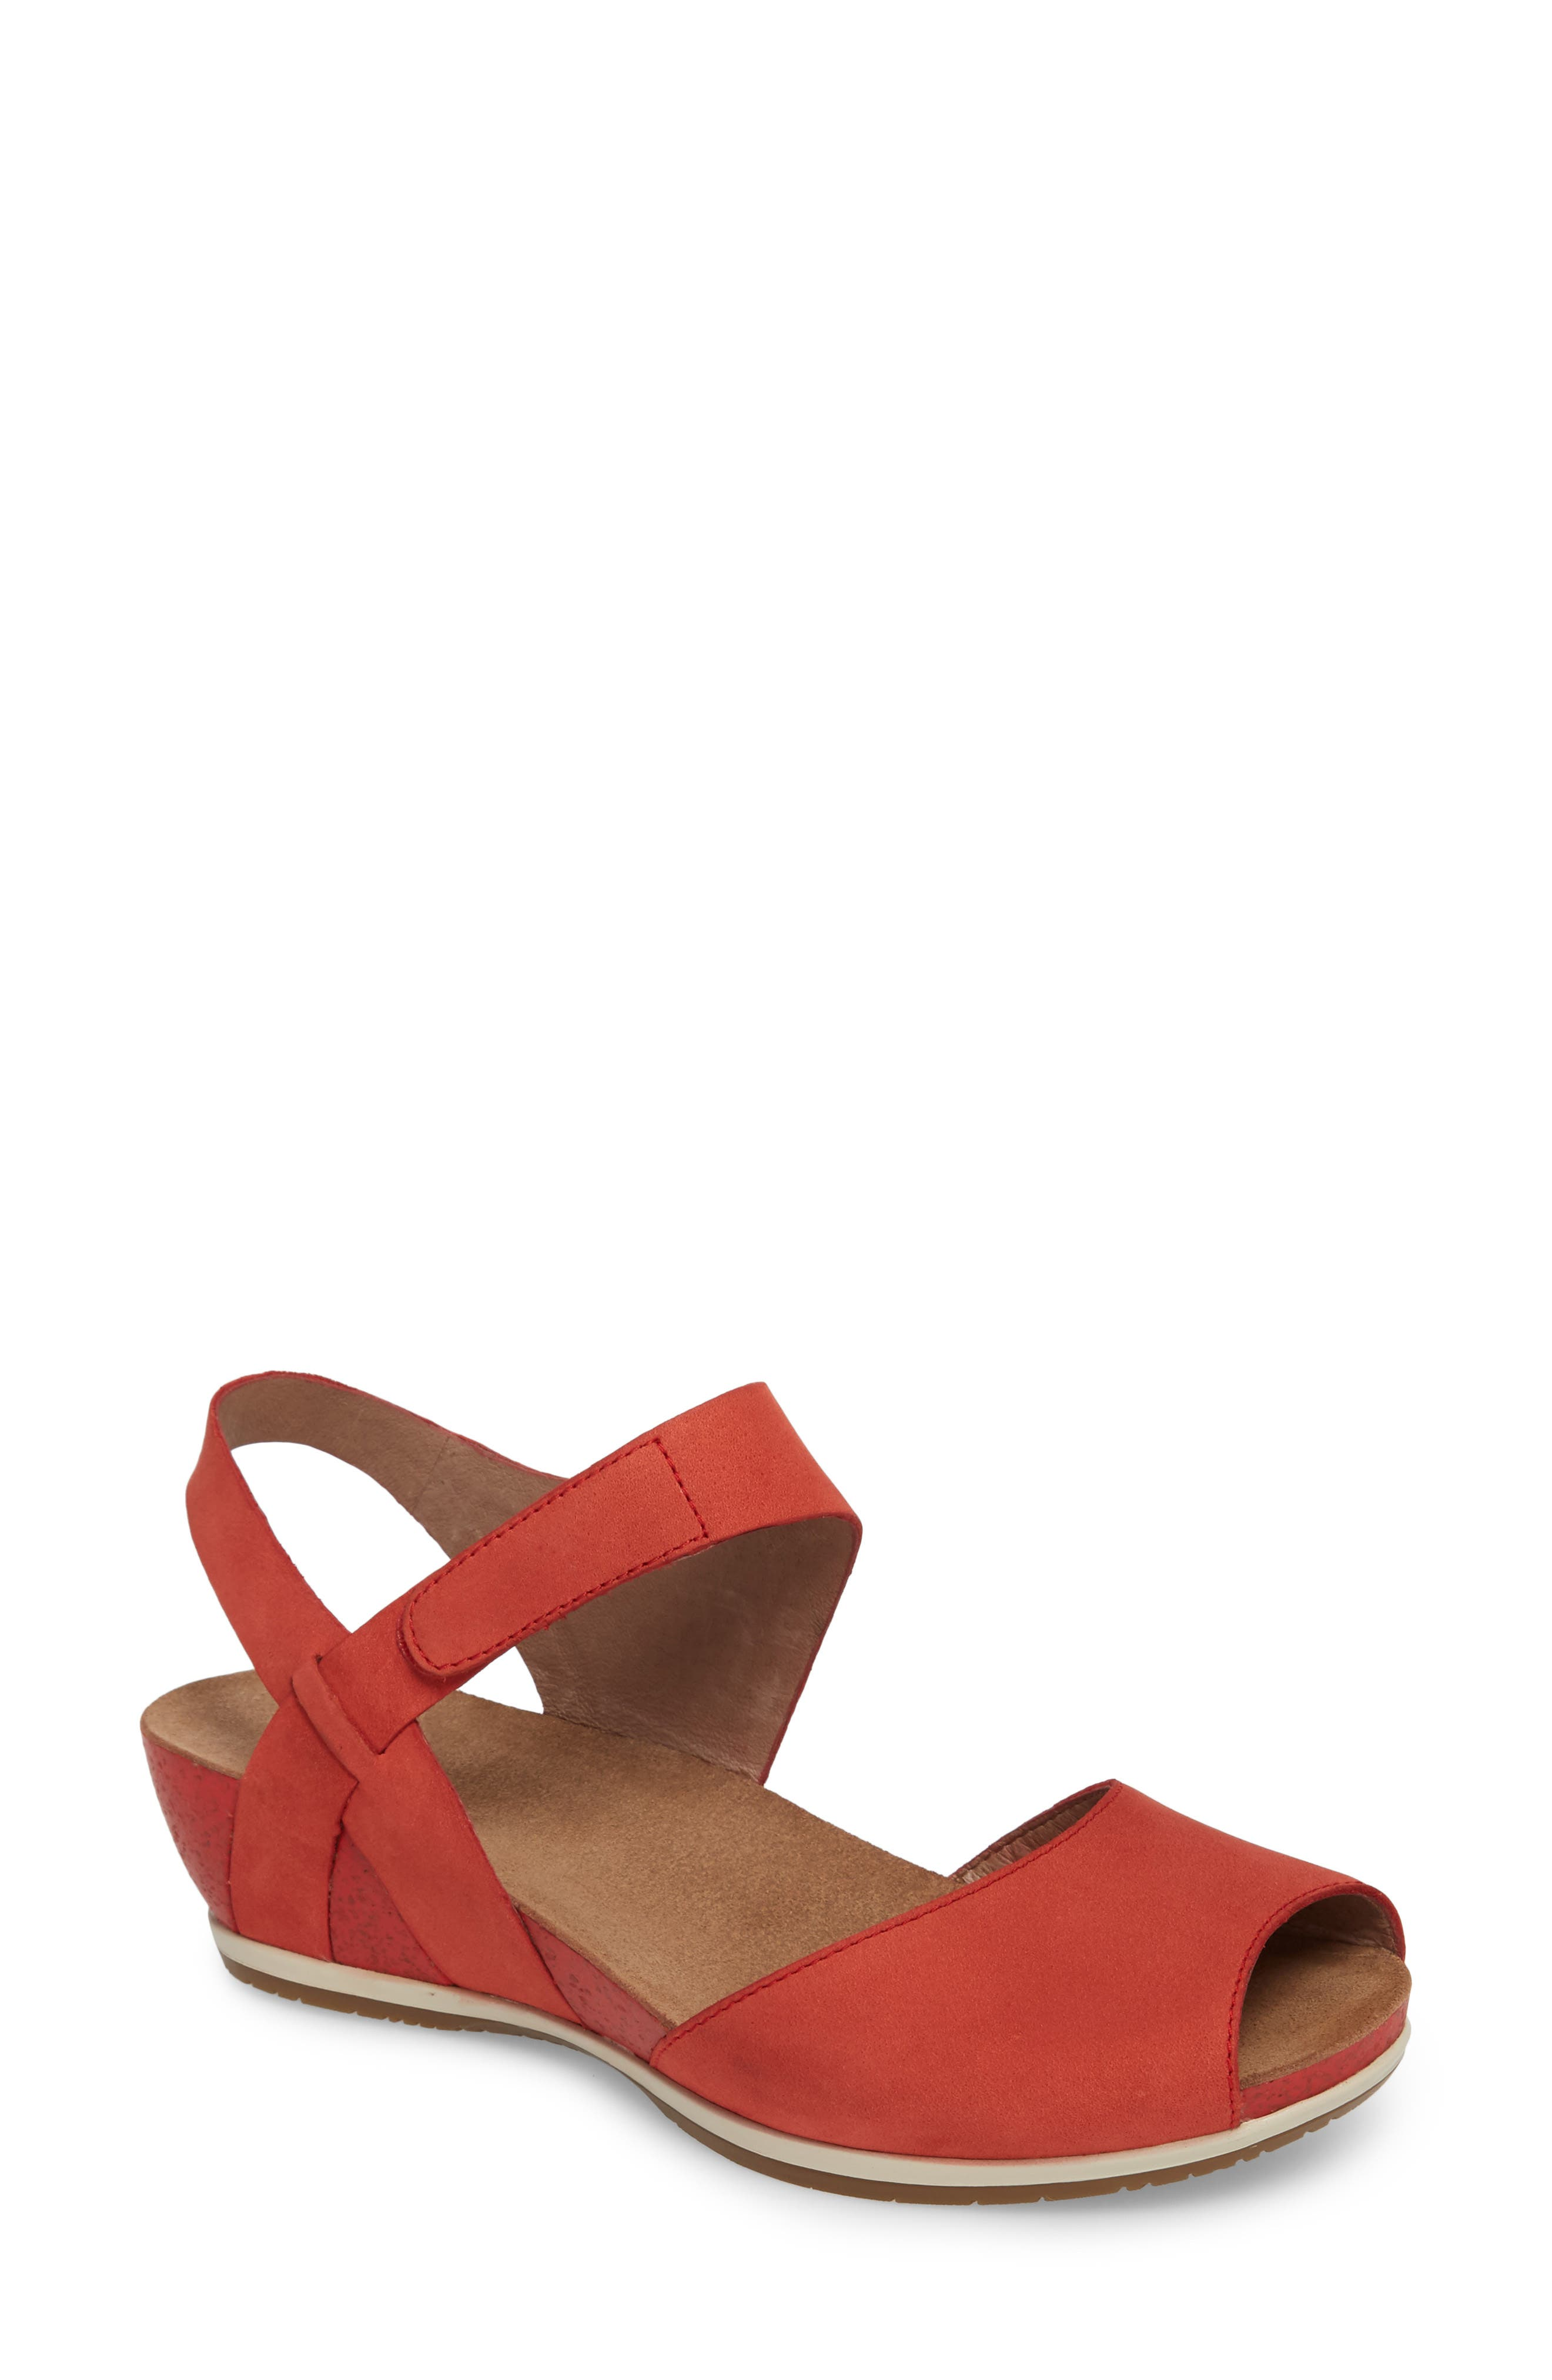 Vera Sandal,                         Main,                         color, Tomato Milled Nubuck Leather